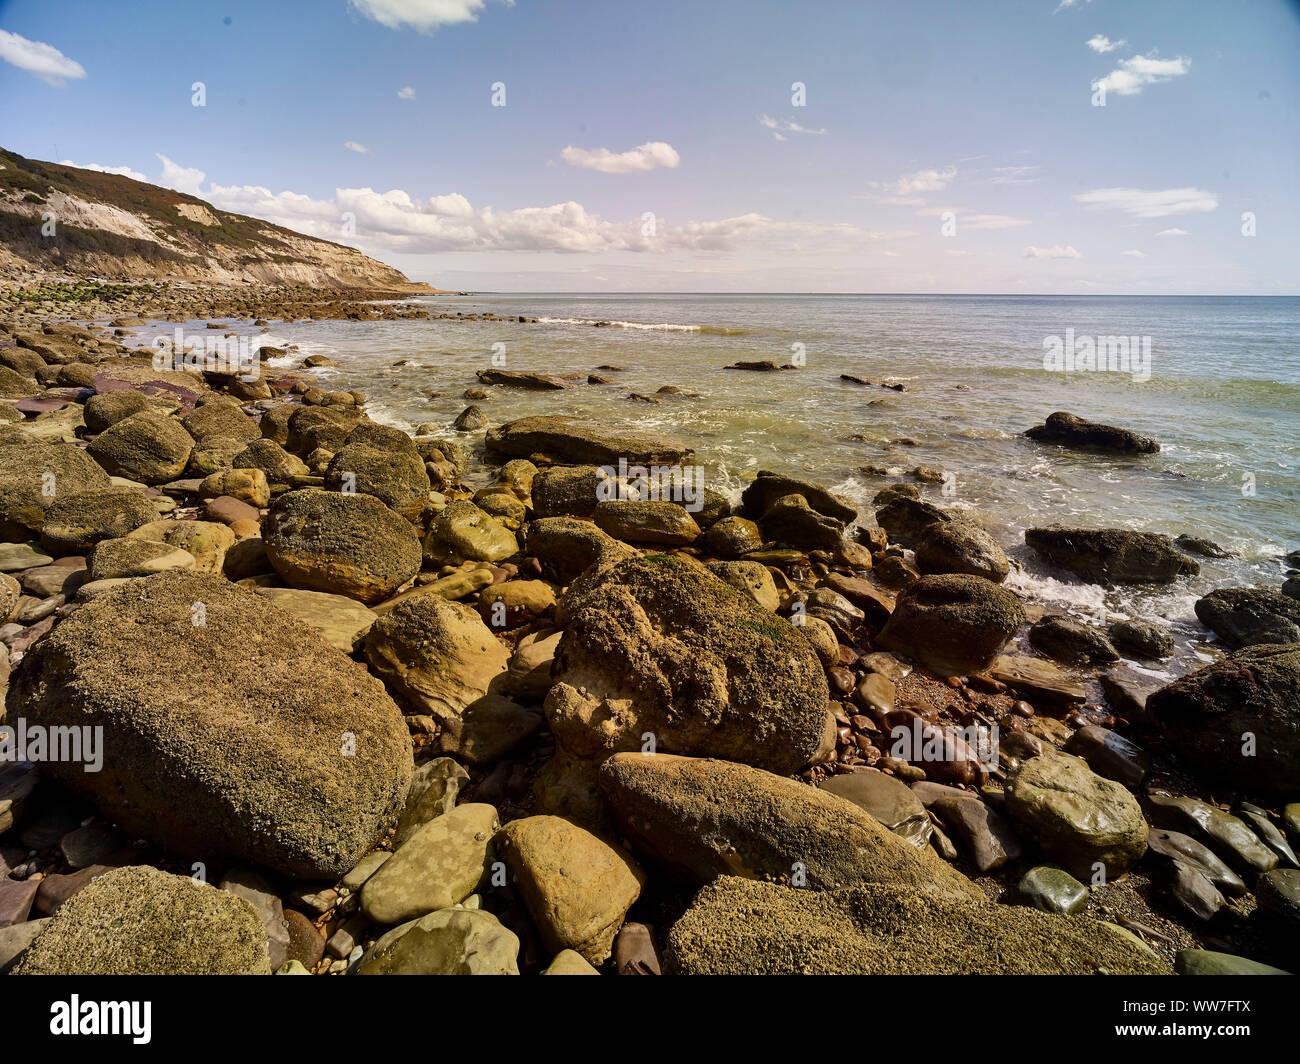 Fkk paare strand